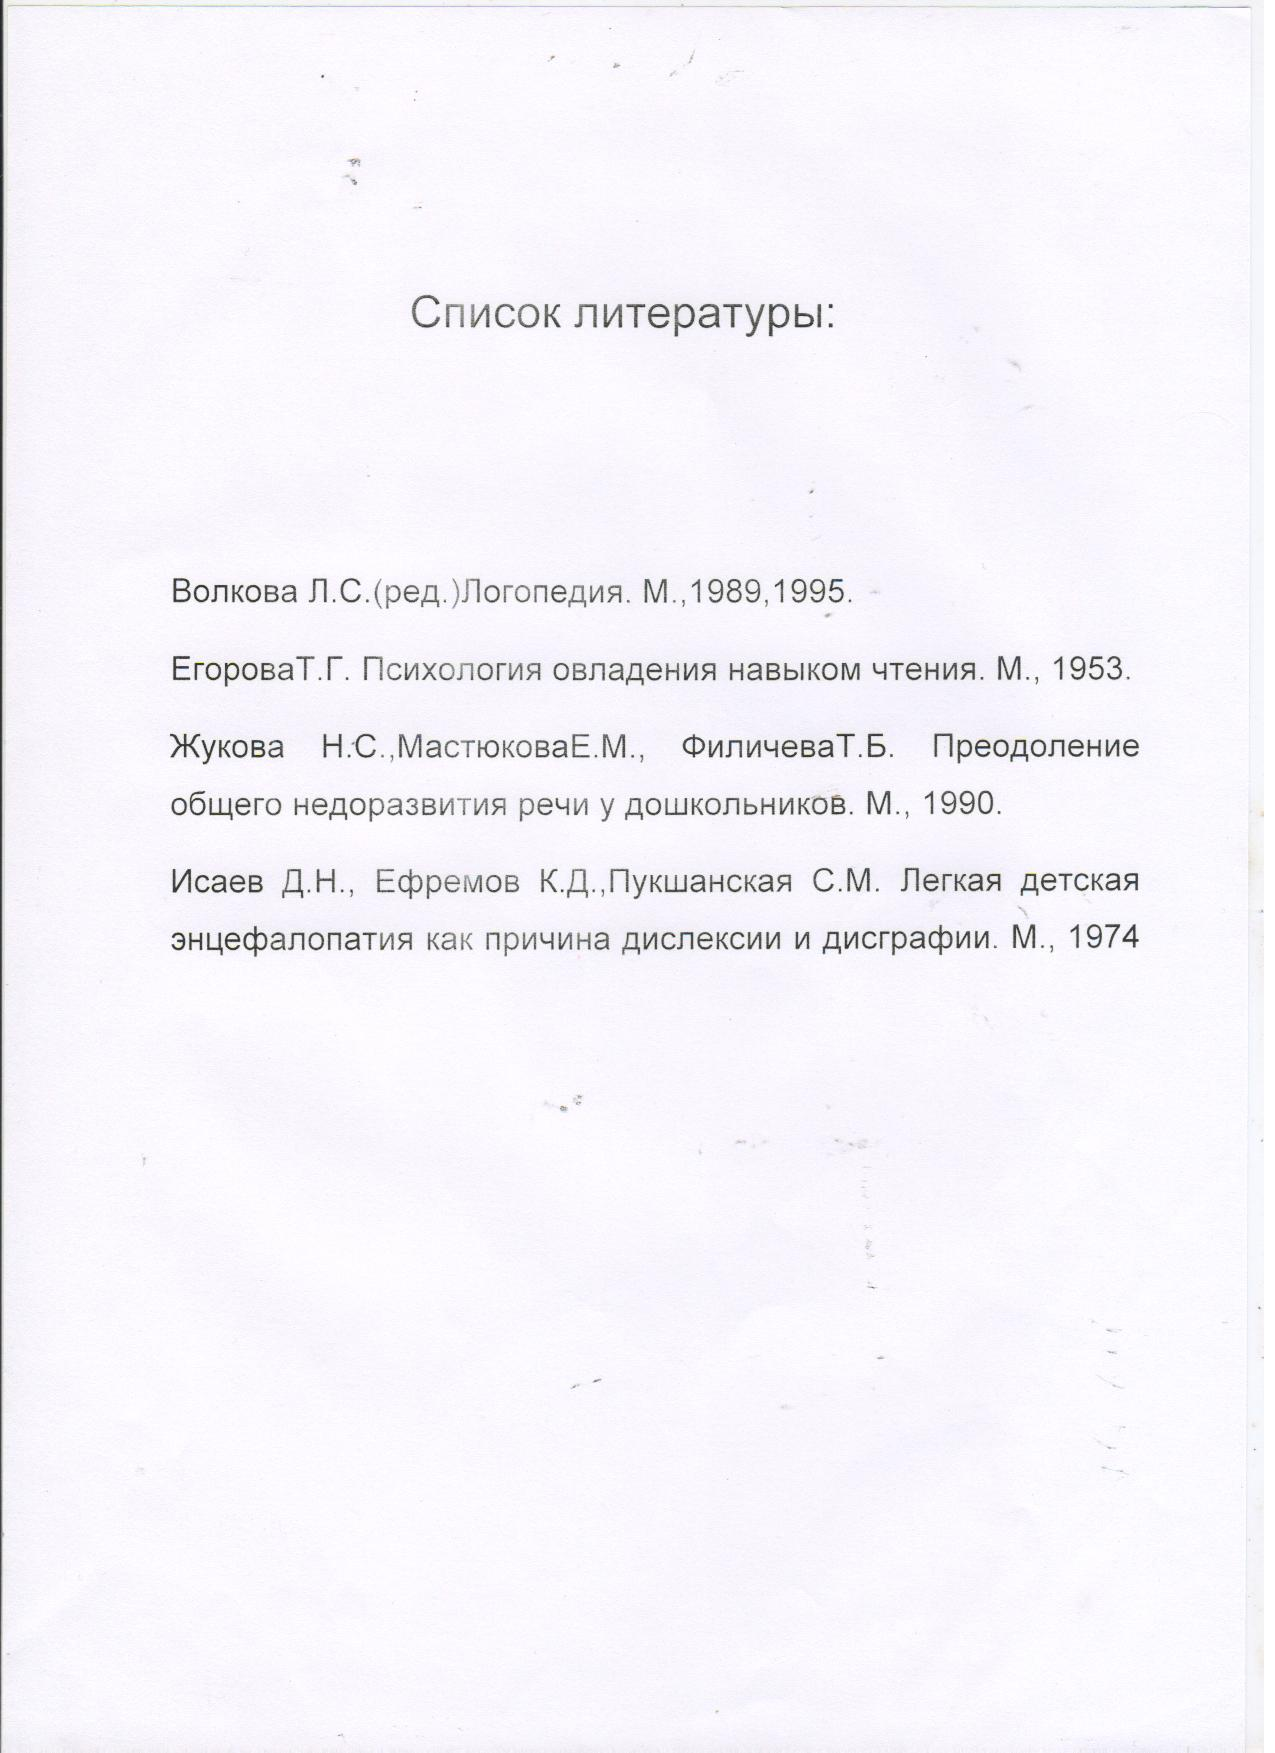 C:\Documents and Settings\Администратор\Рабочий стол\Тептякова Е.А. 013.jpg